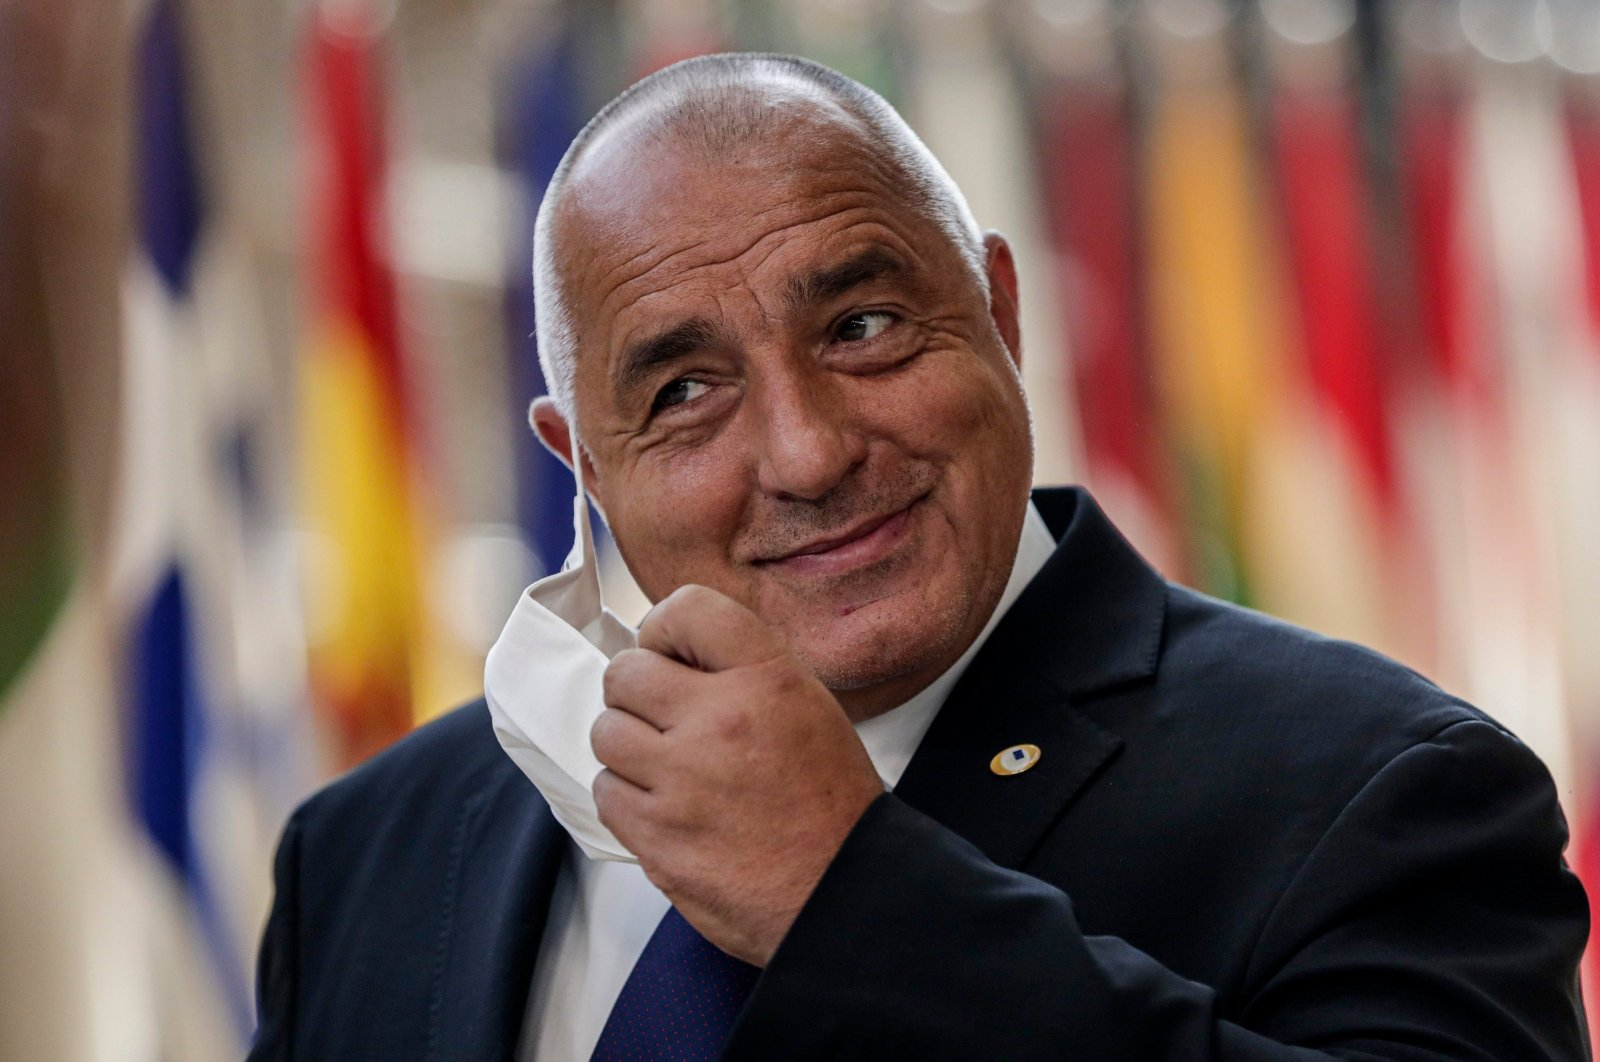 Erdoğan congratulates Bulgaria's Borisov for election victory